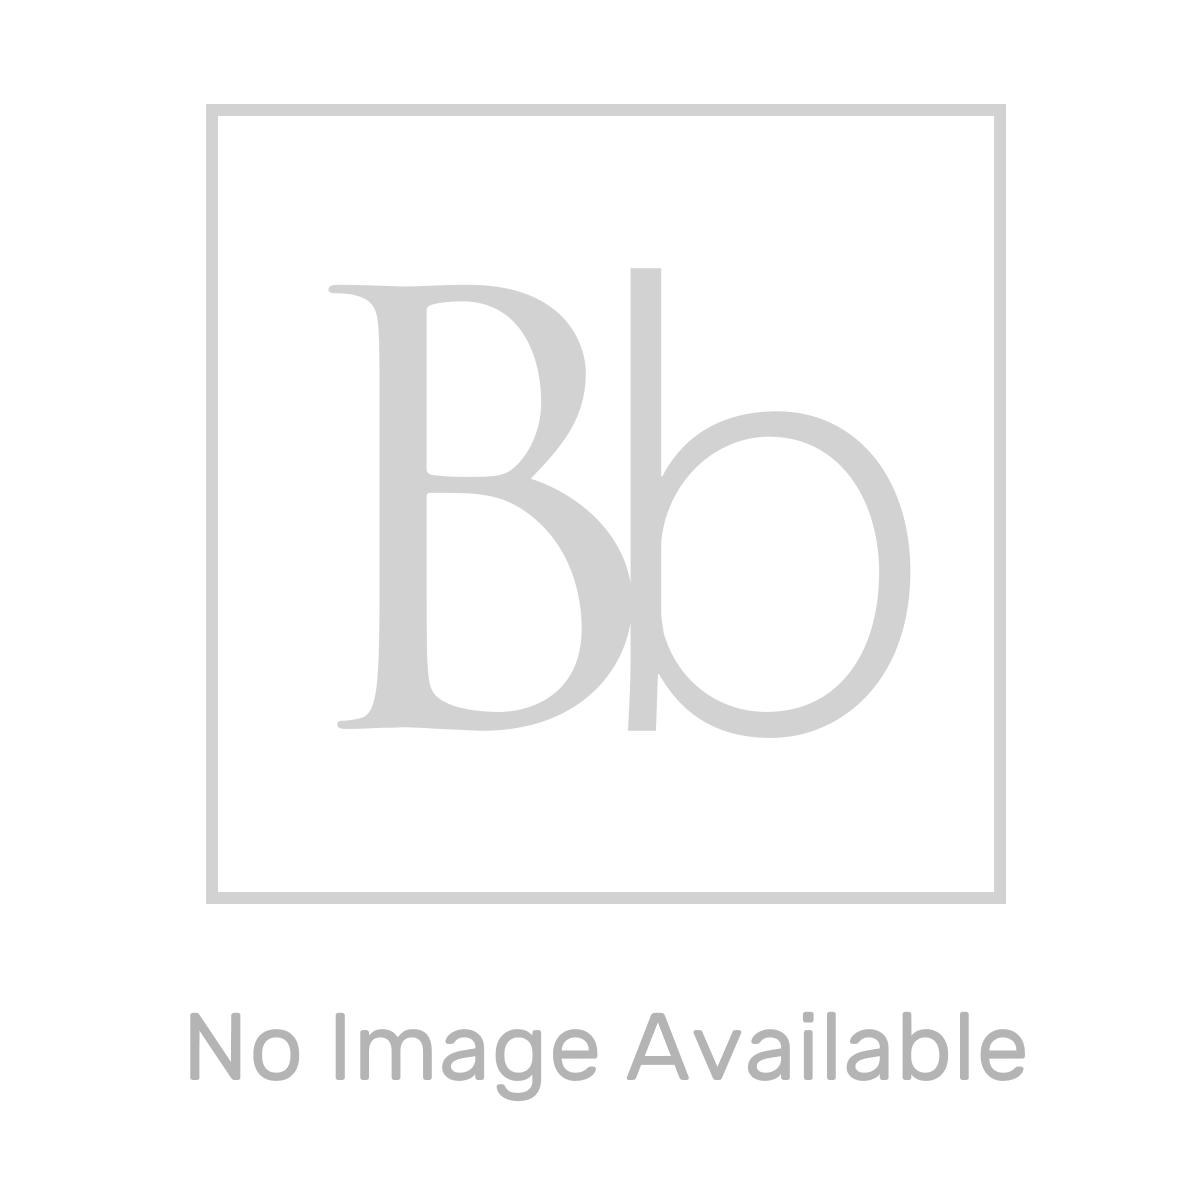 RAK Compact Wall Hung 2 Tap Hole Corner Basin